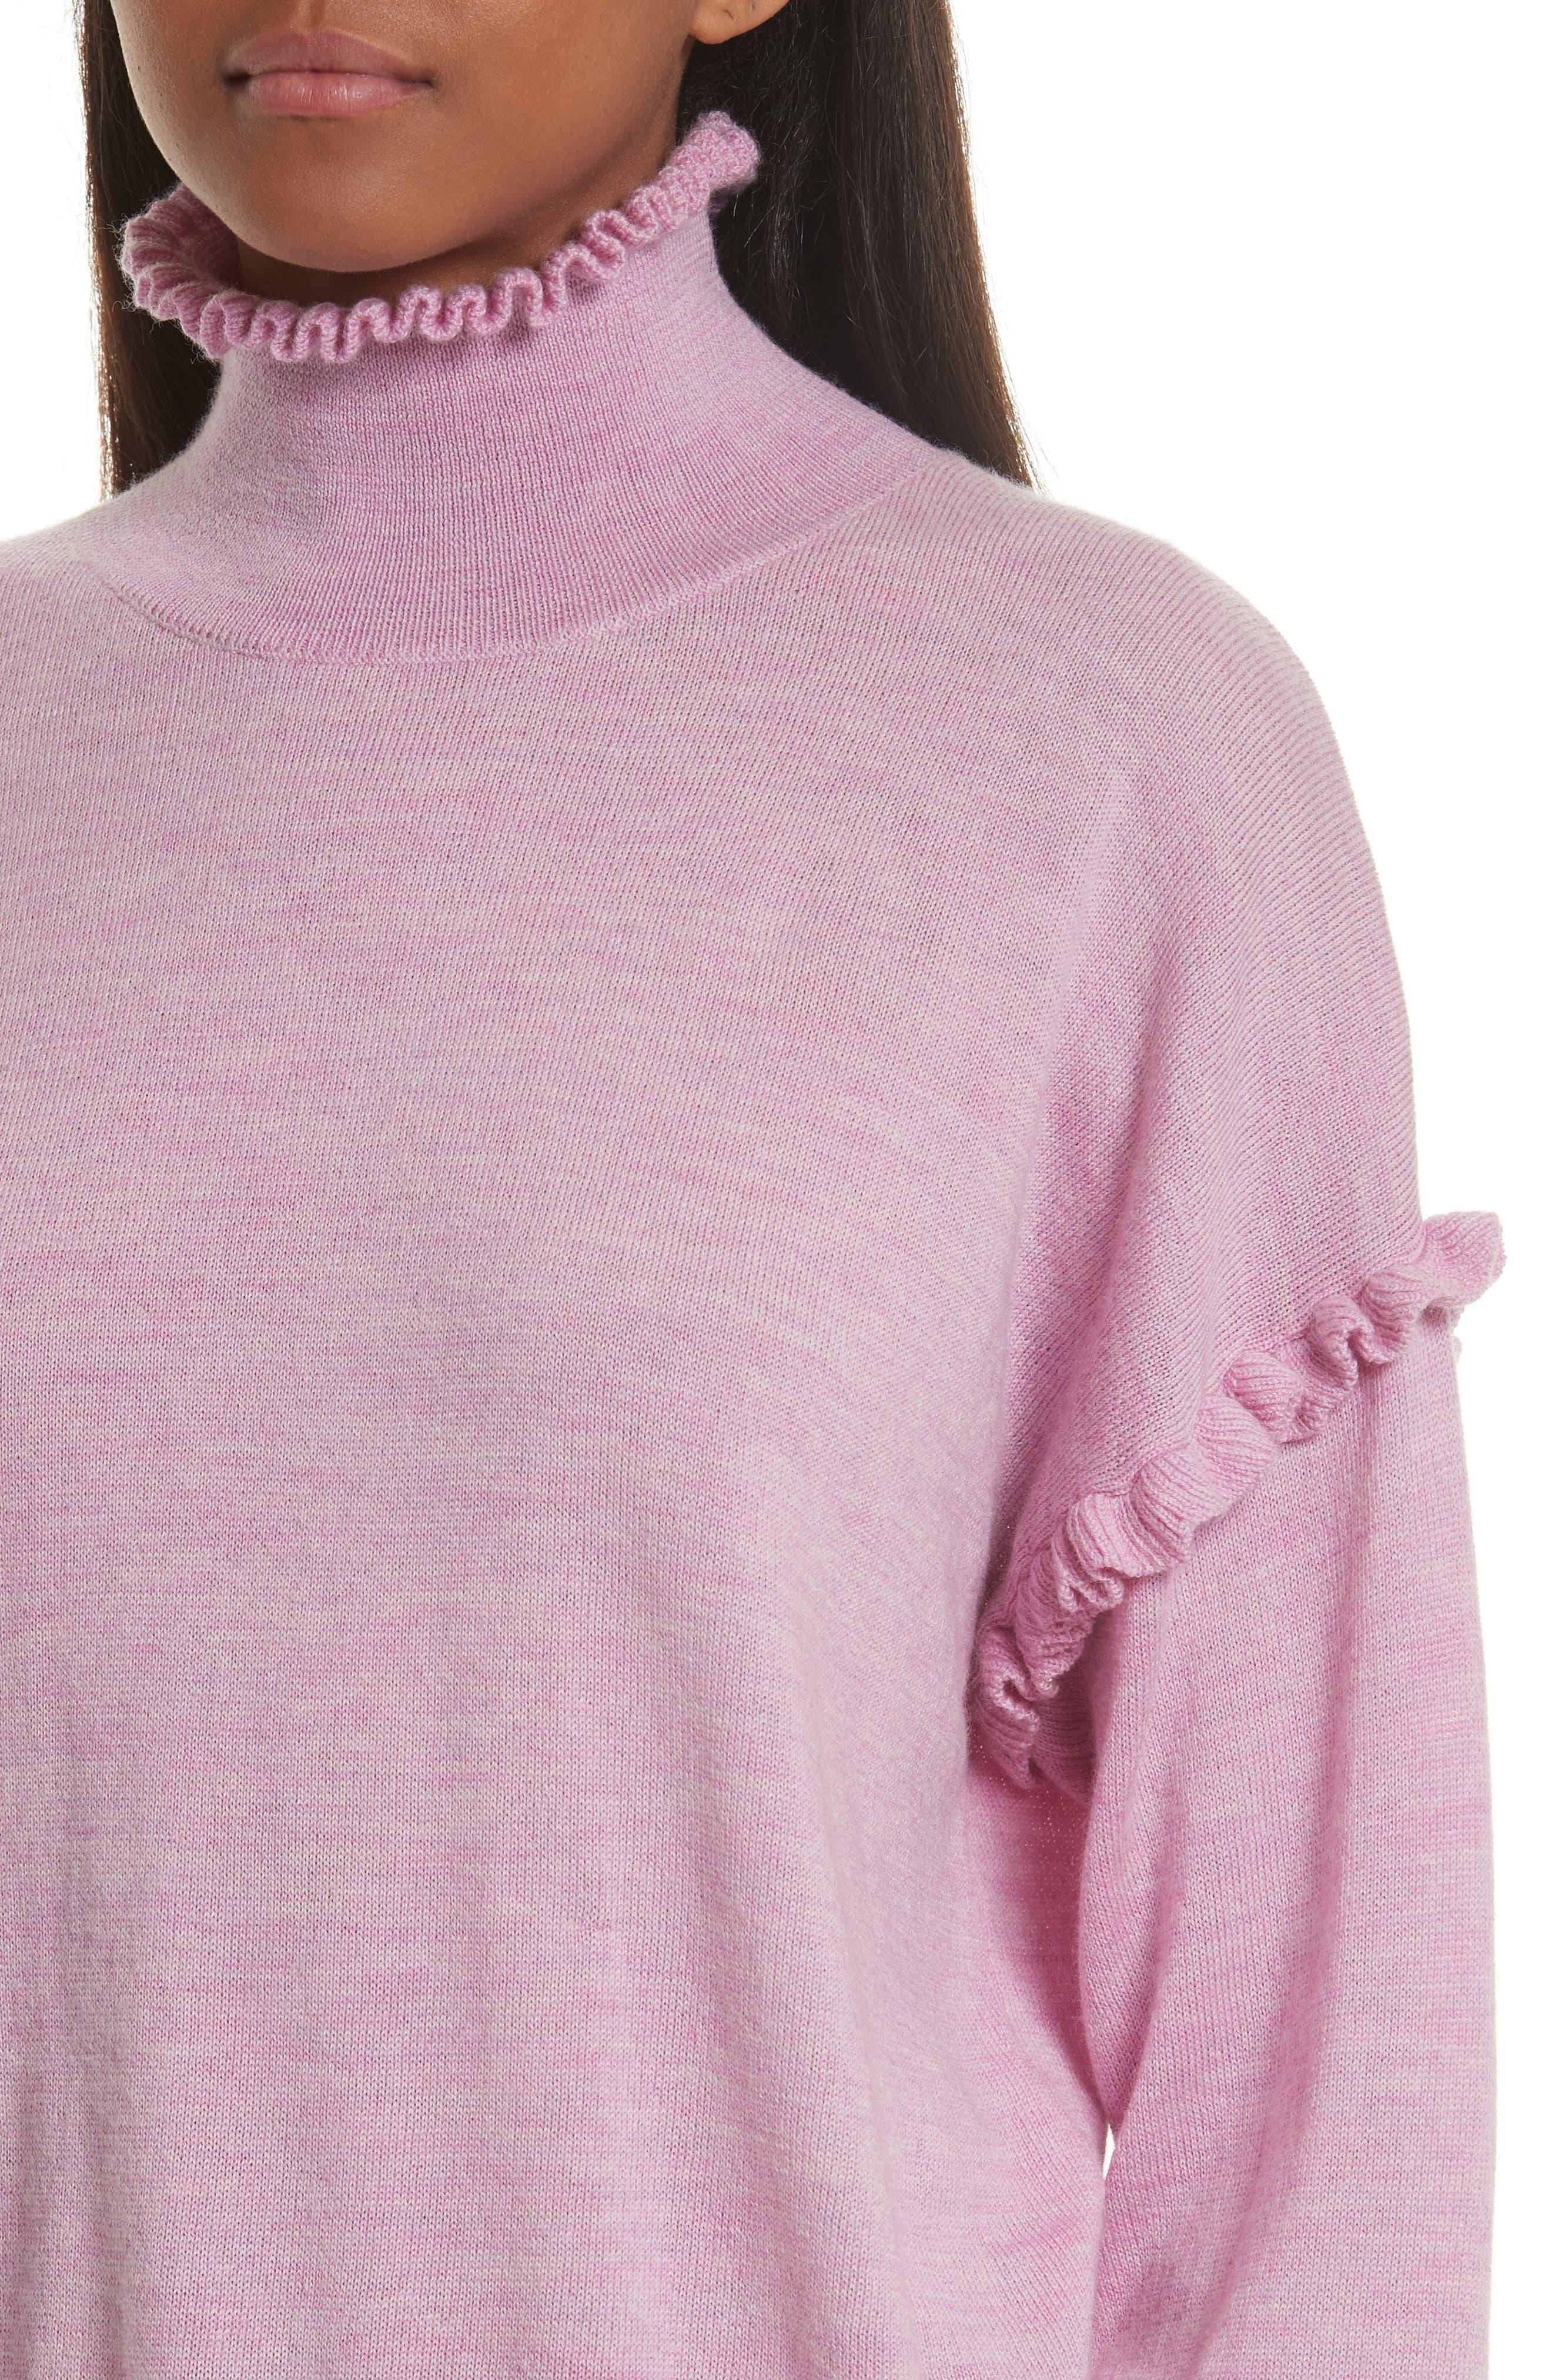 Turtleneck Merino Wool Sweater,                             Alternate thumbnail 4, color,                             691